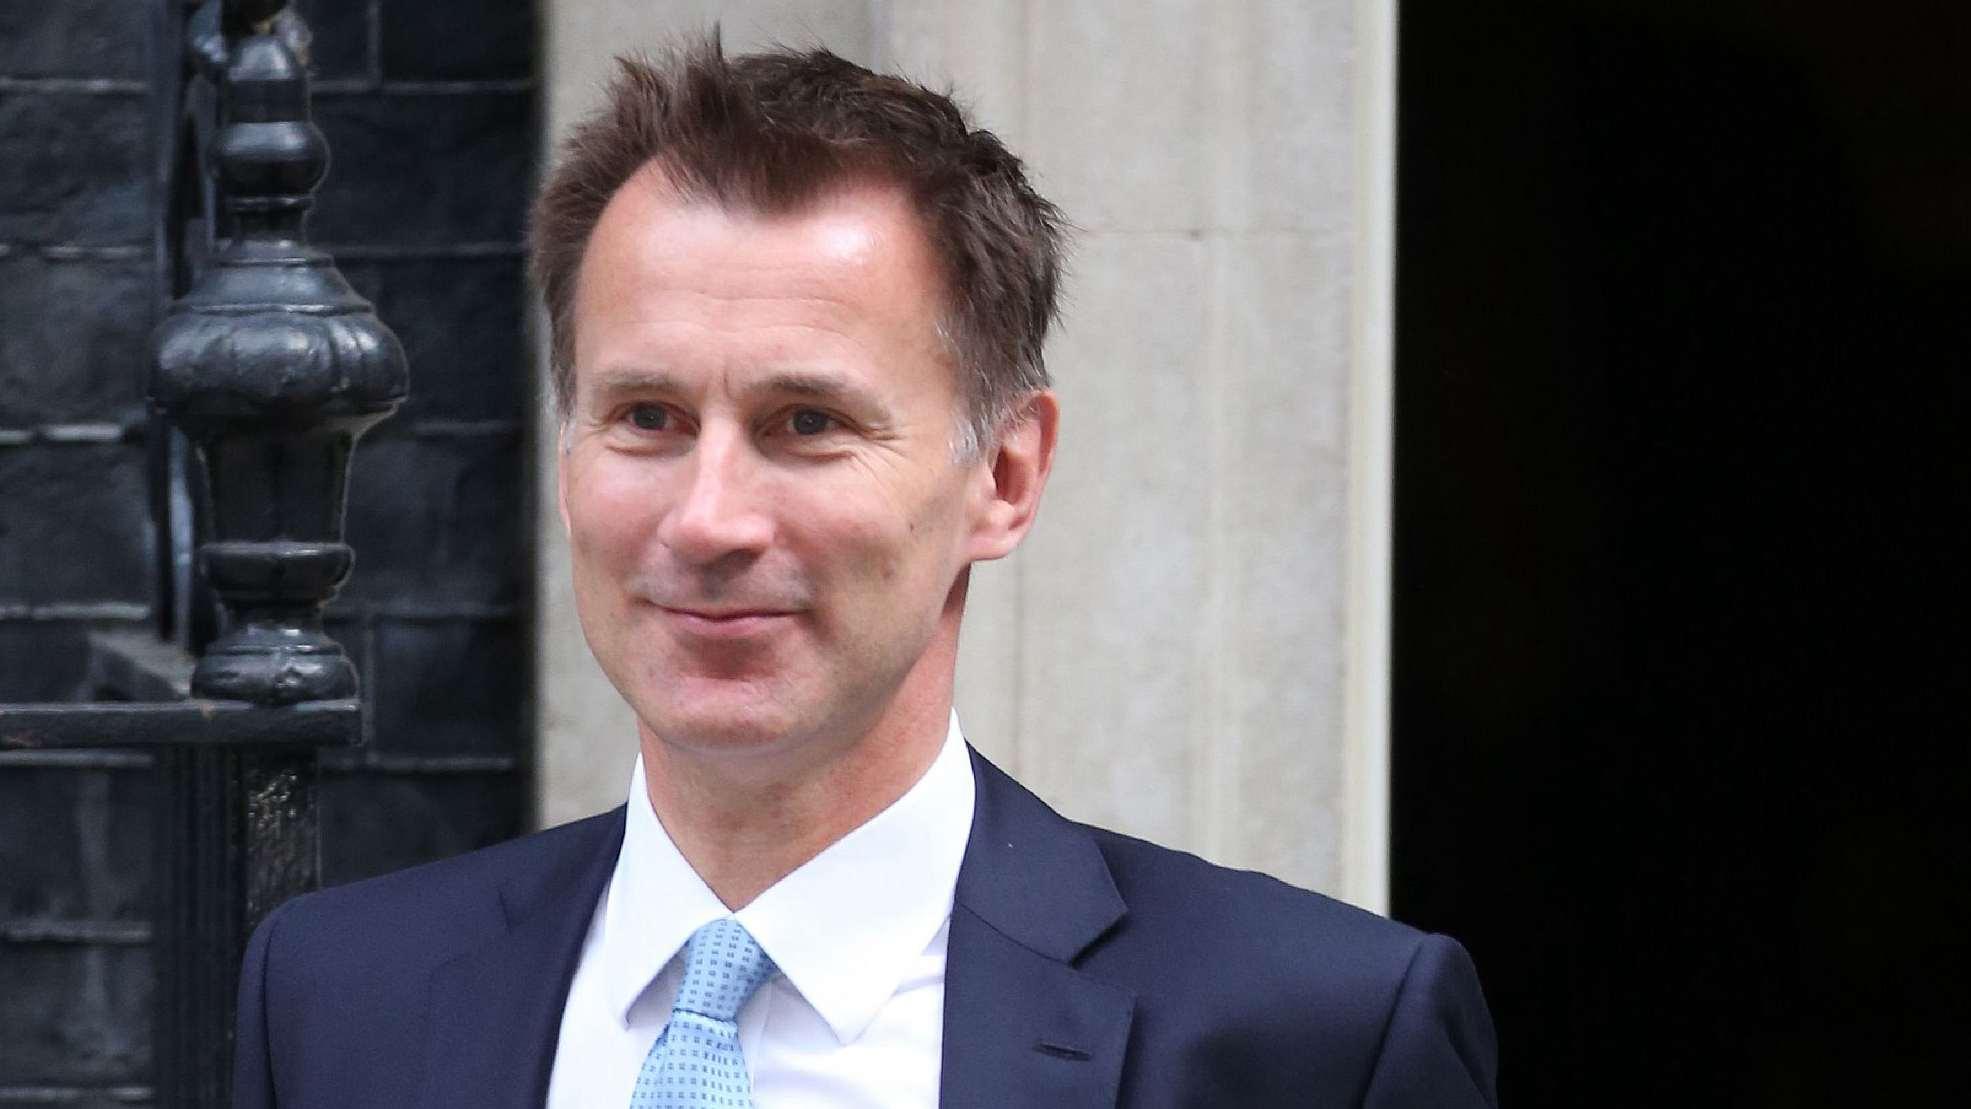 British new Foreign Secretary Jeremy Hunt to visit China